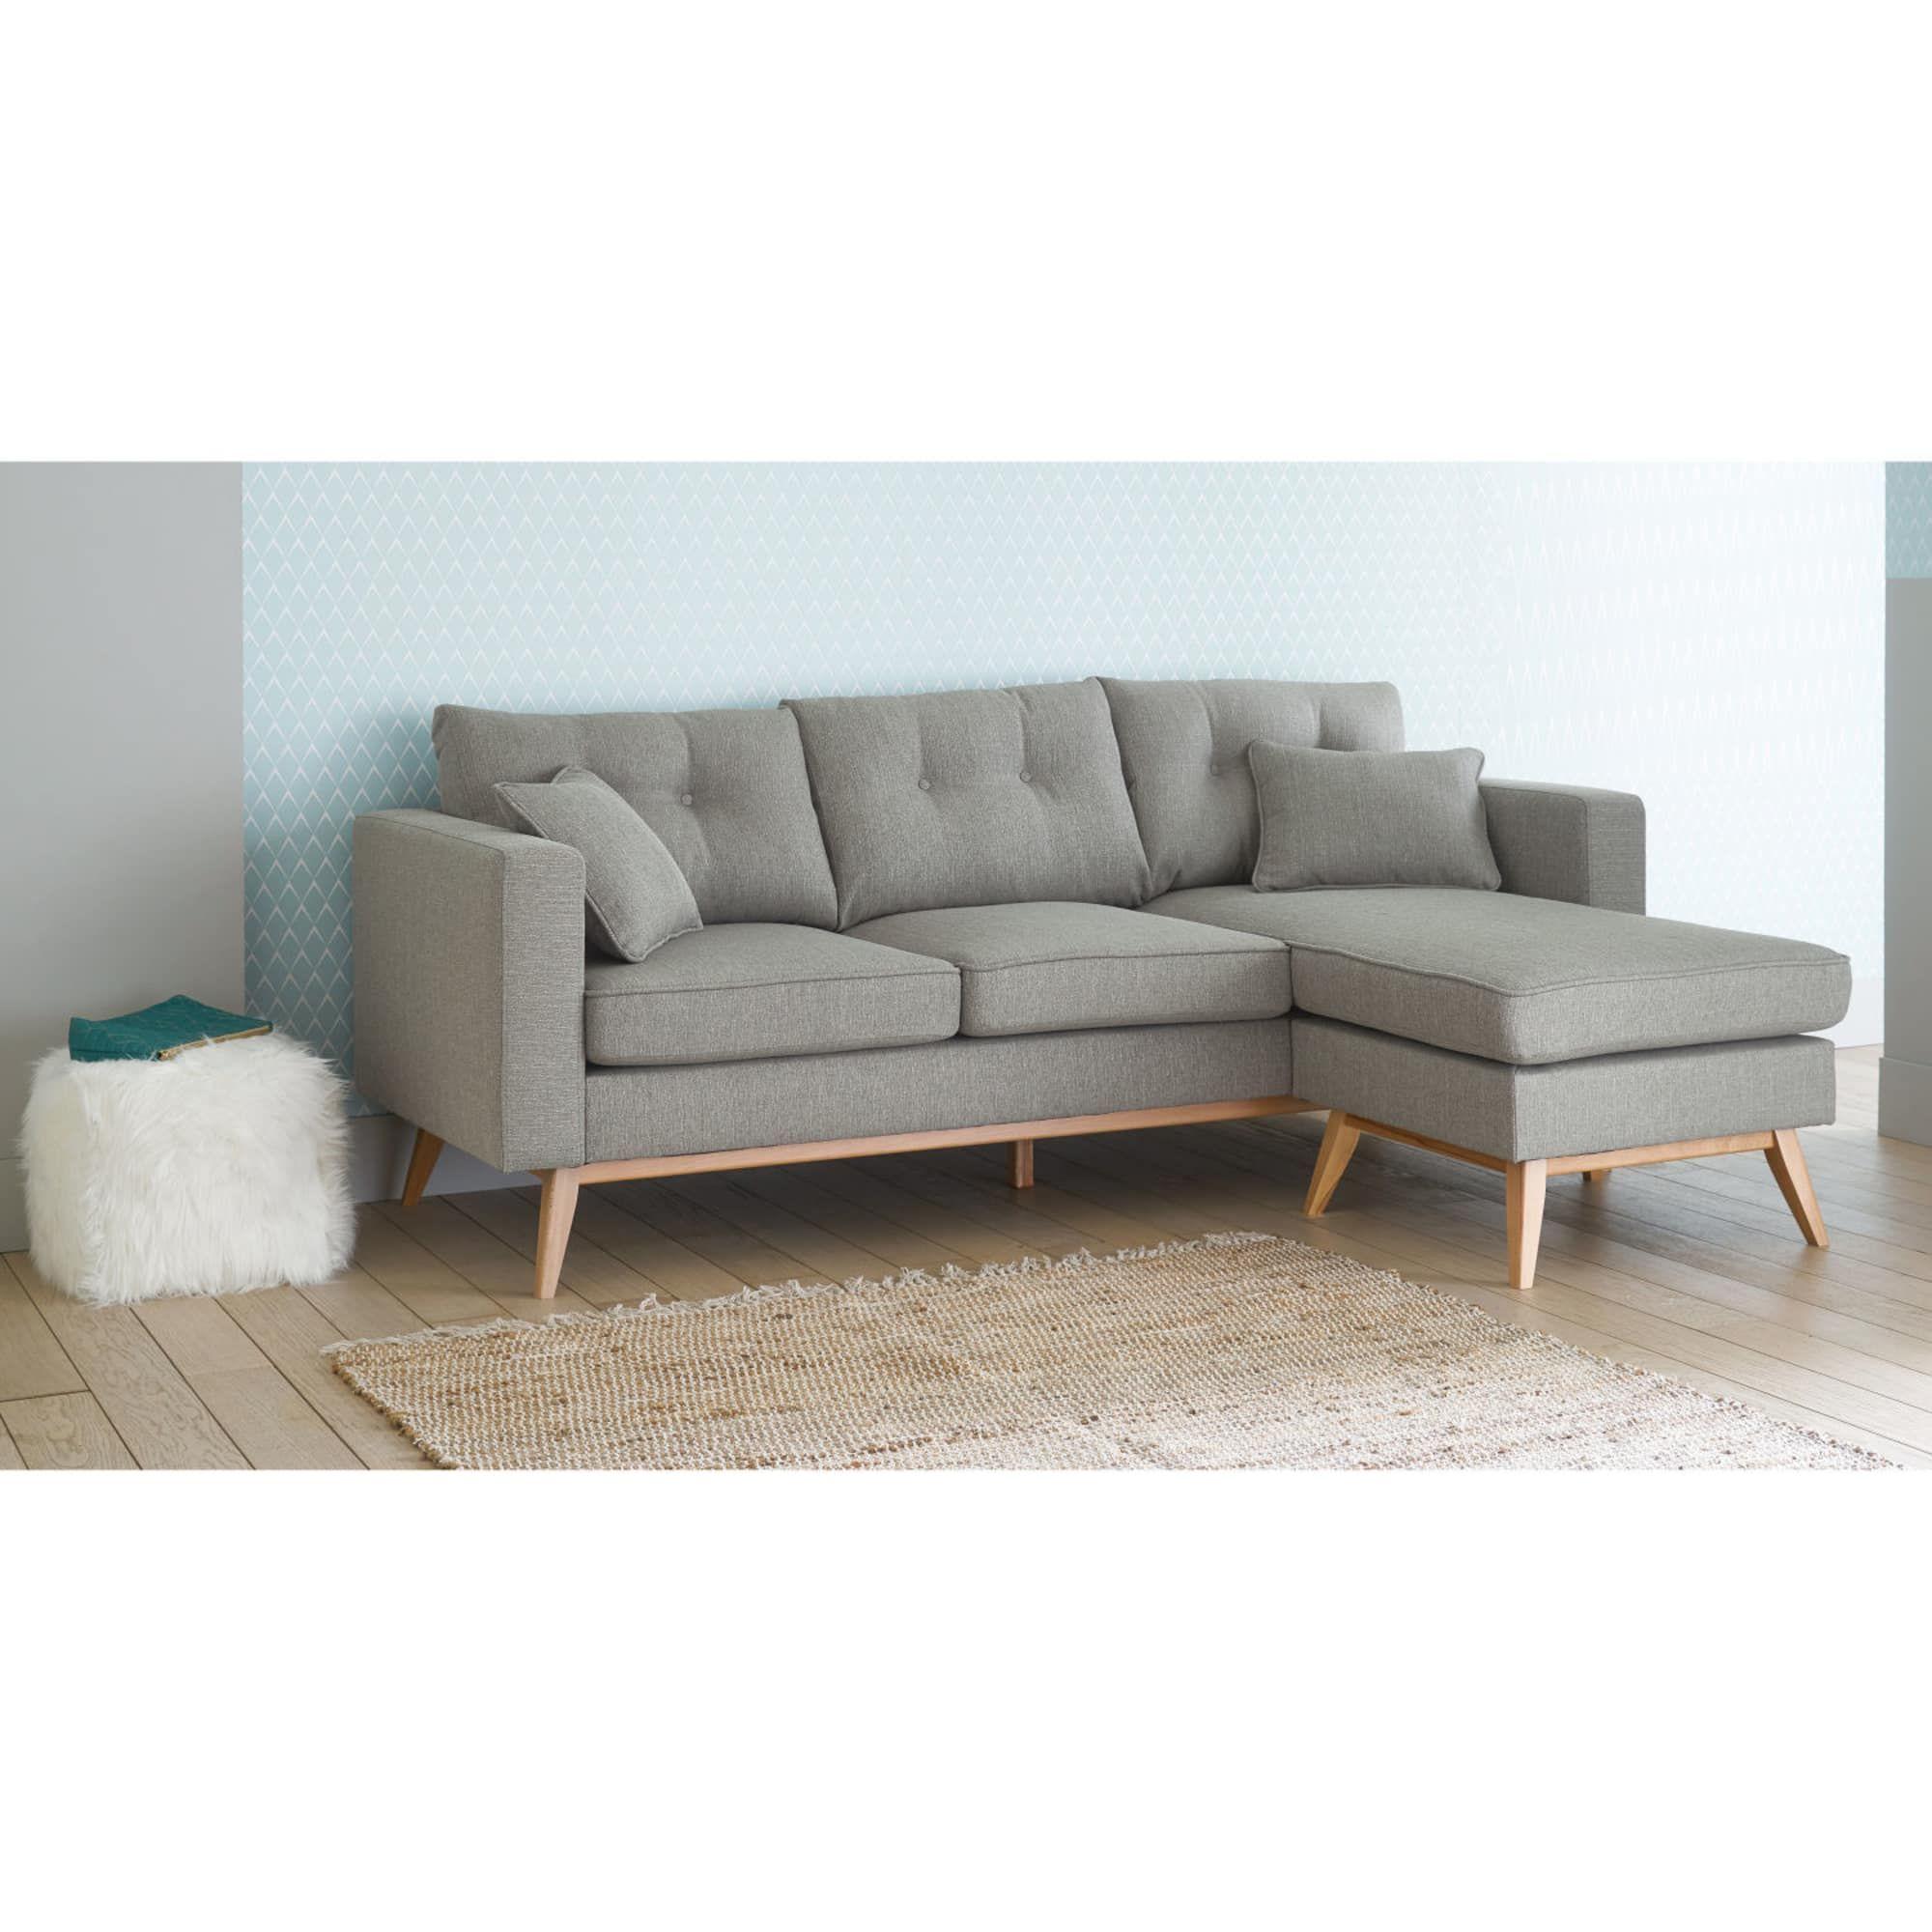 Seater Light Grey Modular Corner Sofa